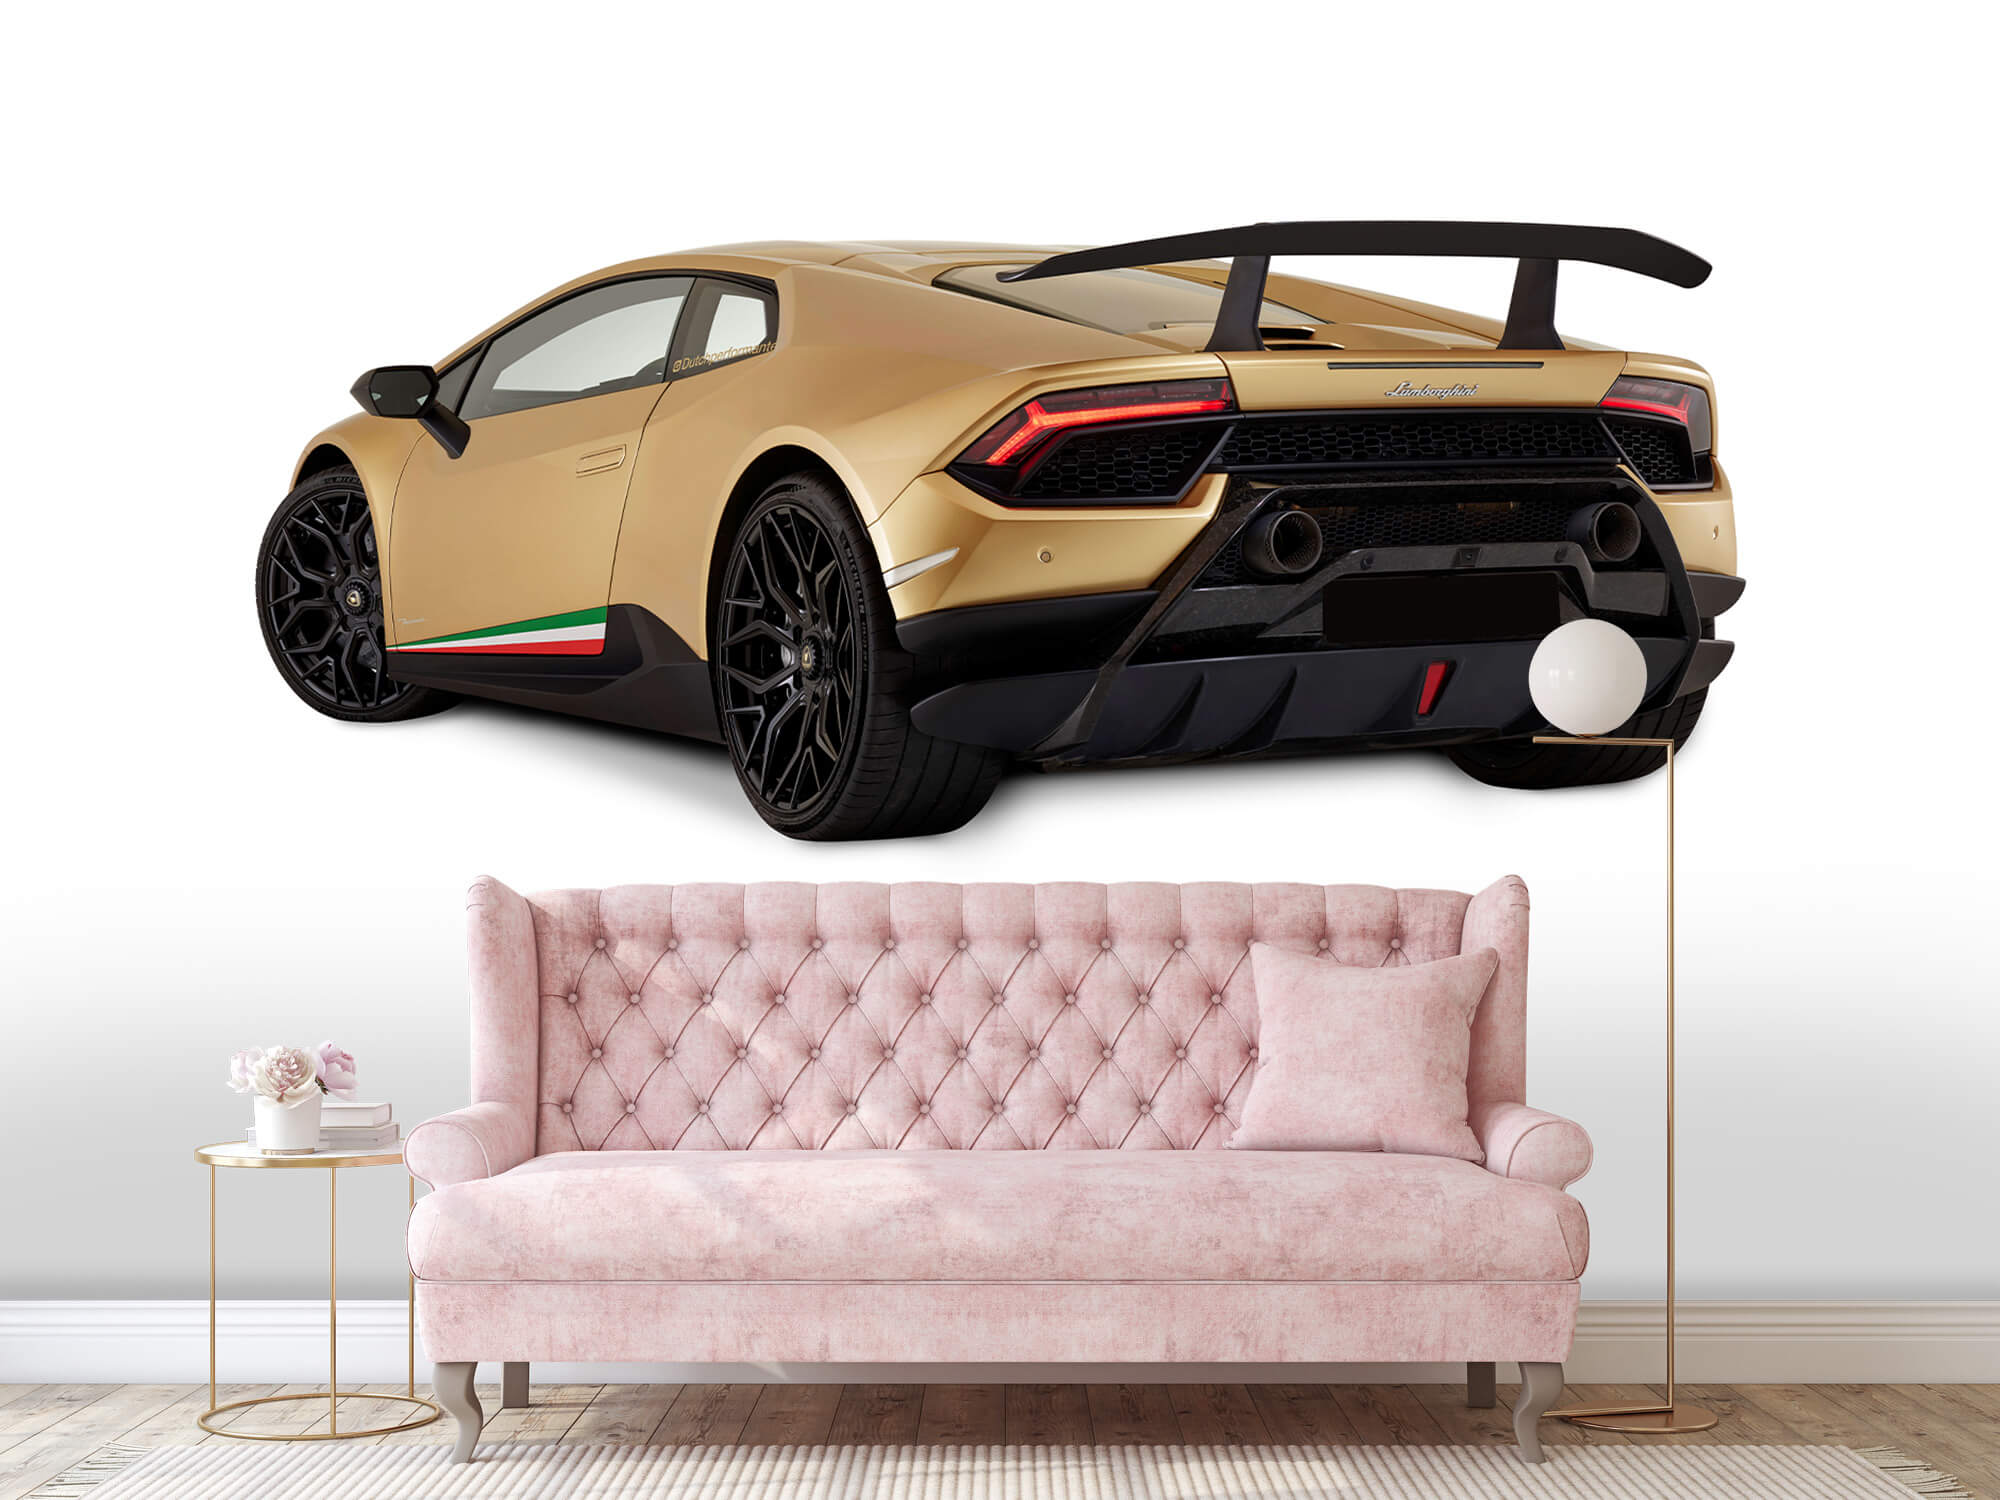 Wallpaper Lamborghini Huracán - Côté arrière gauche, blanc 13